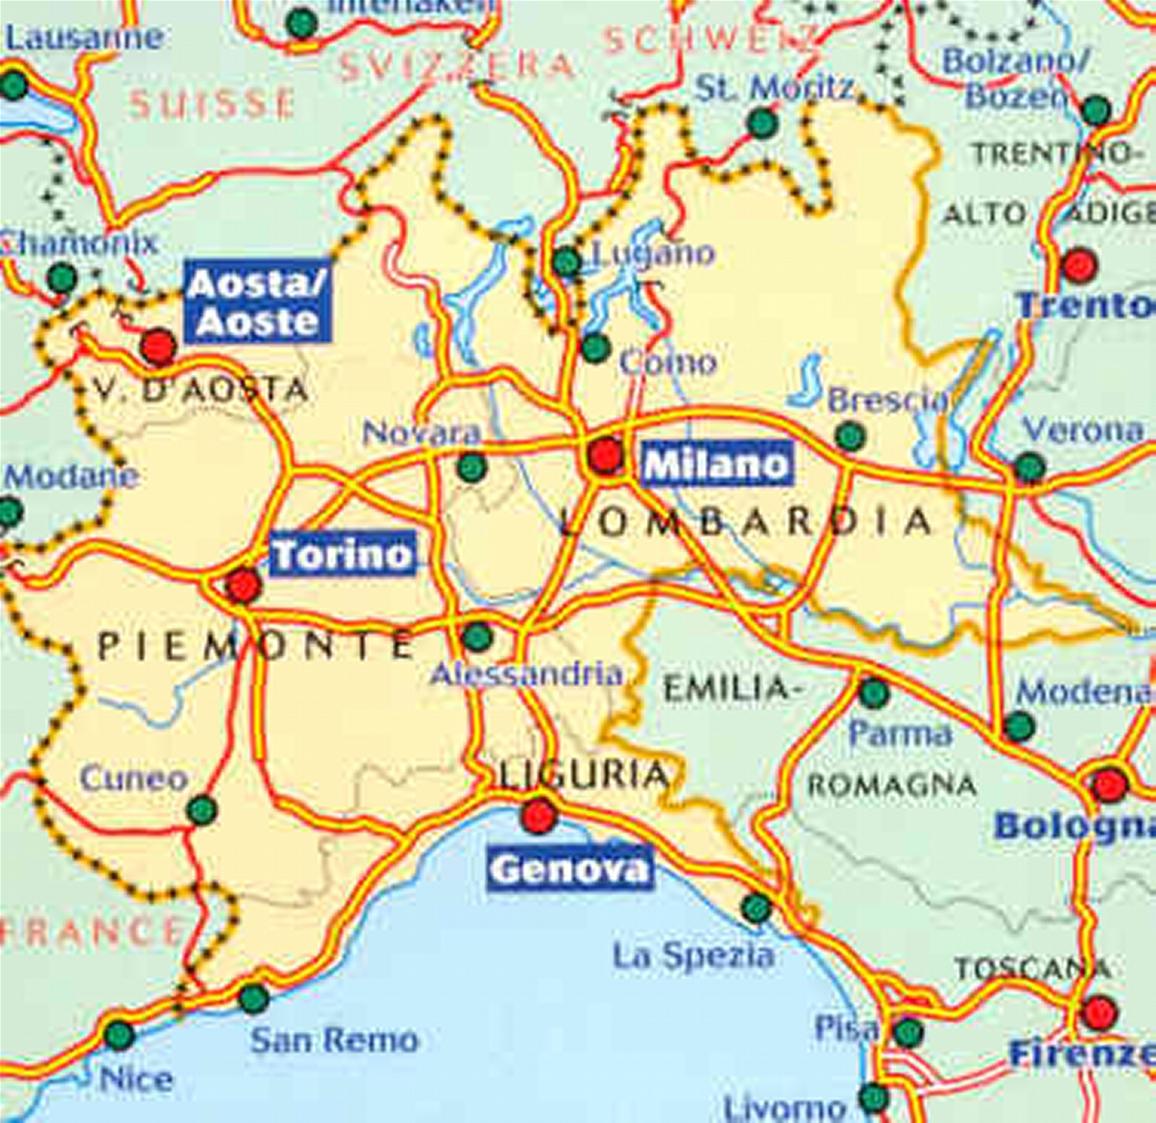 Lombardia & Piemonte Provinces